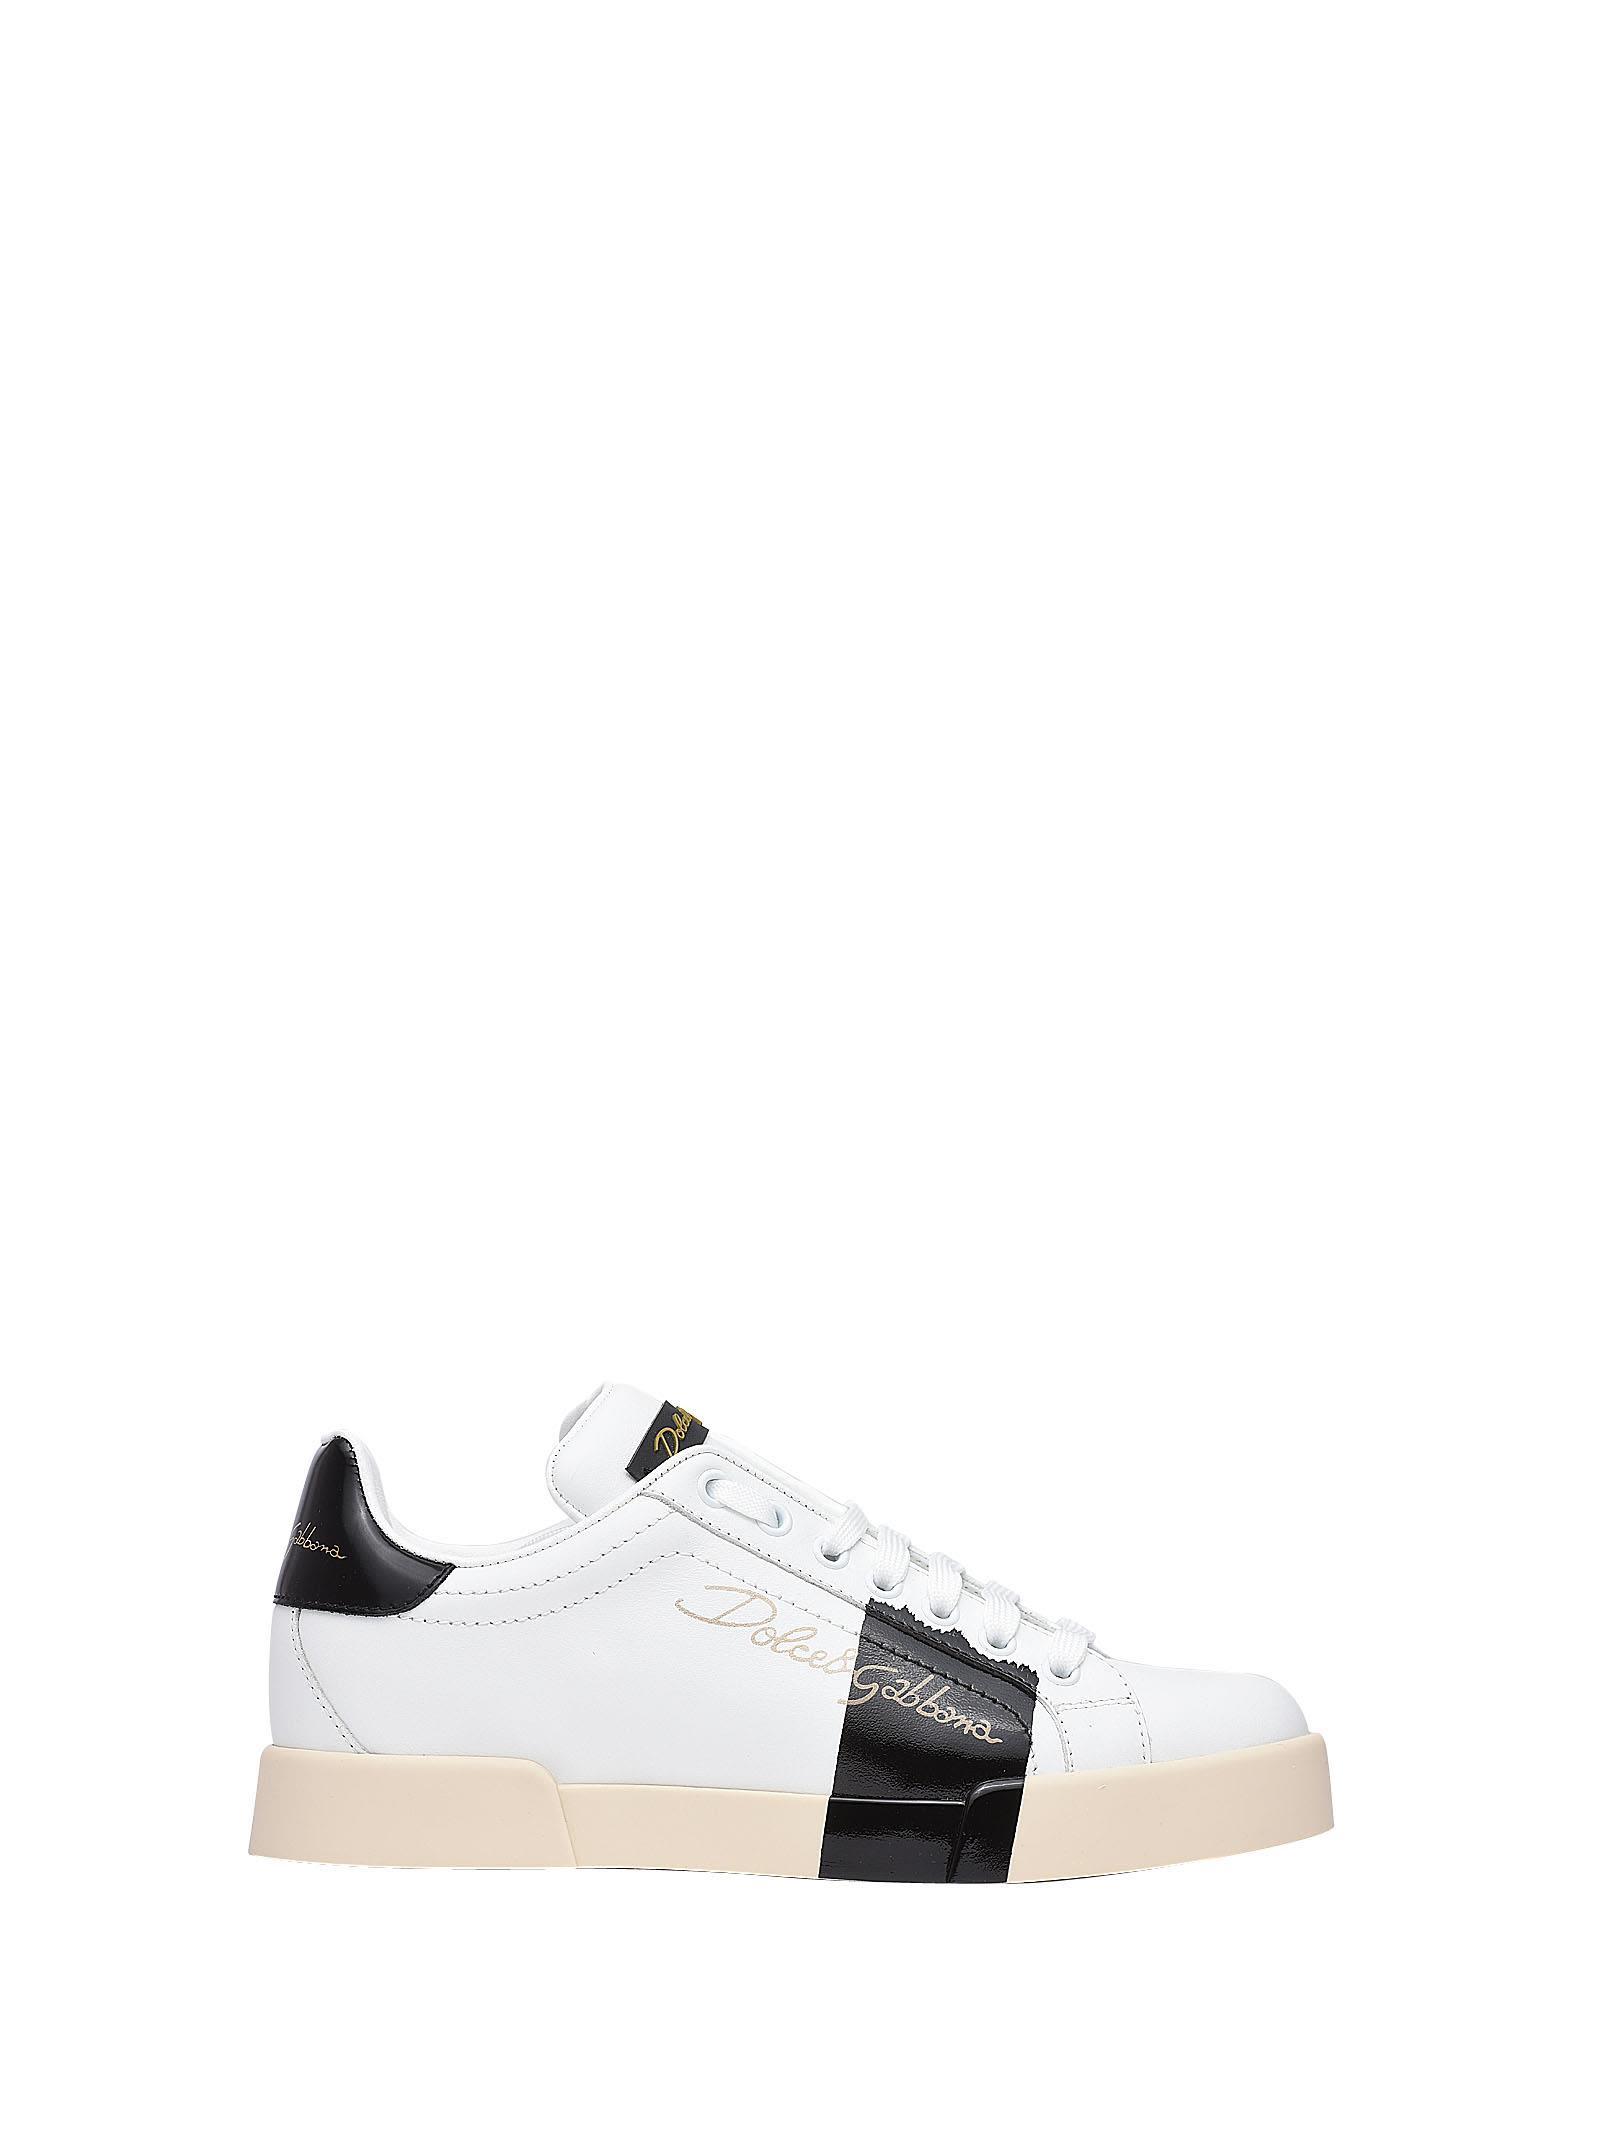 Dolce & gabbana Sneakers White-black